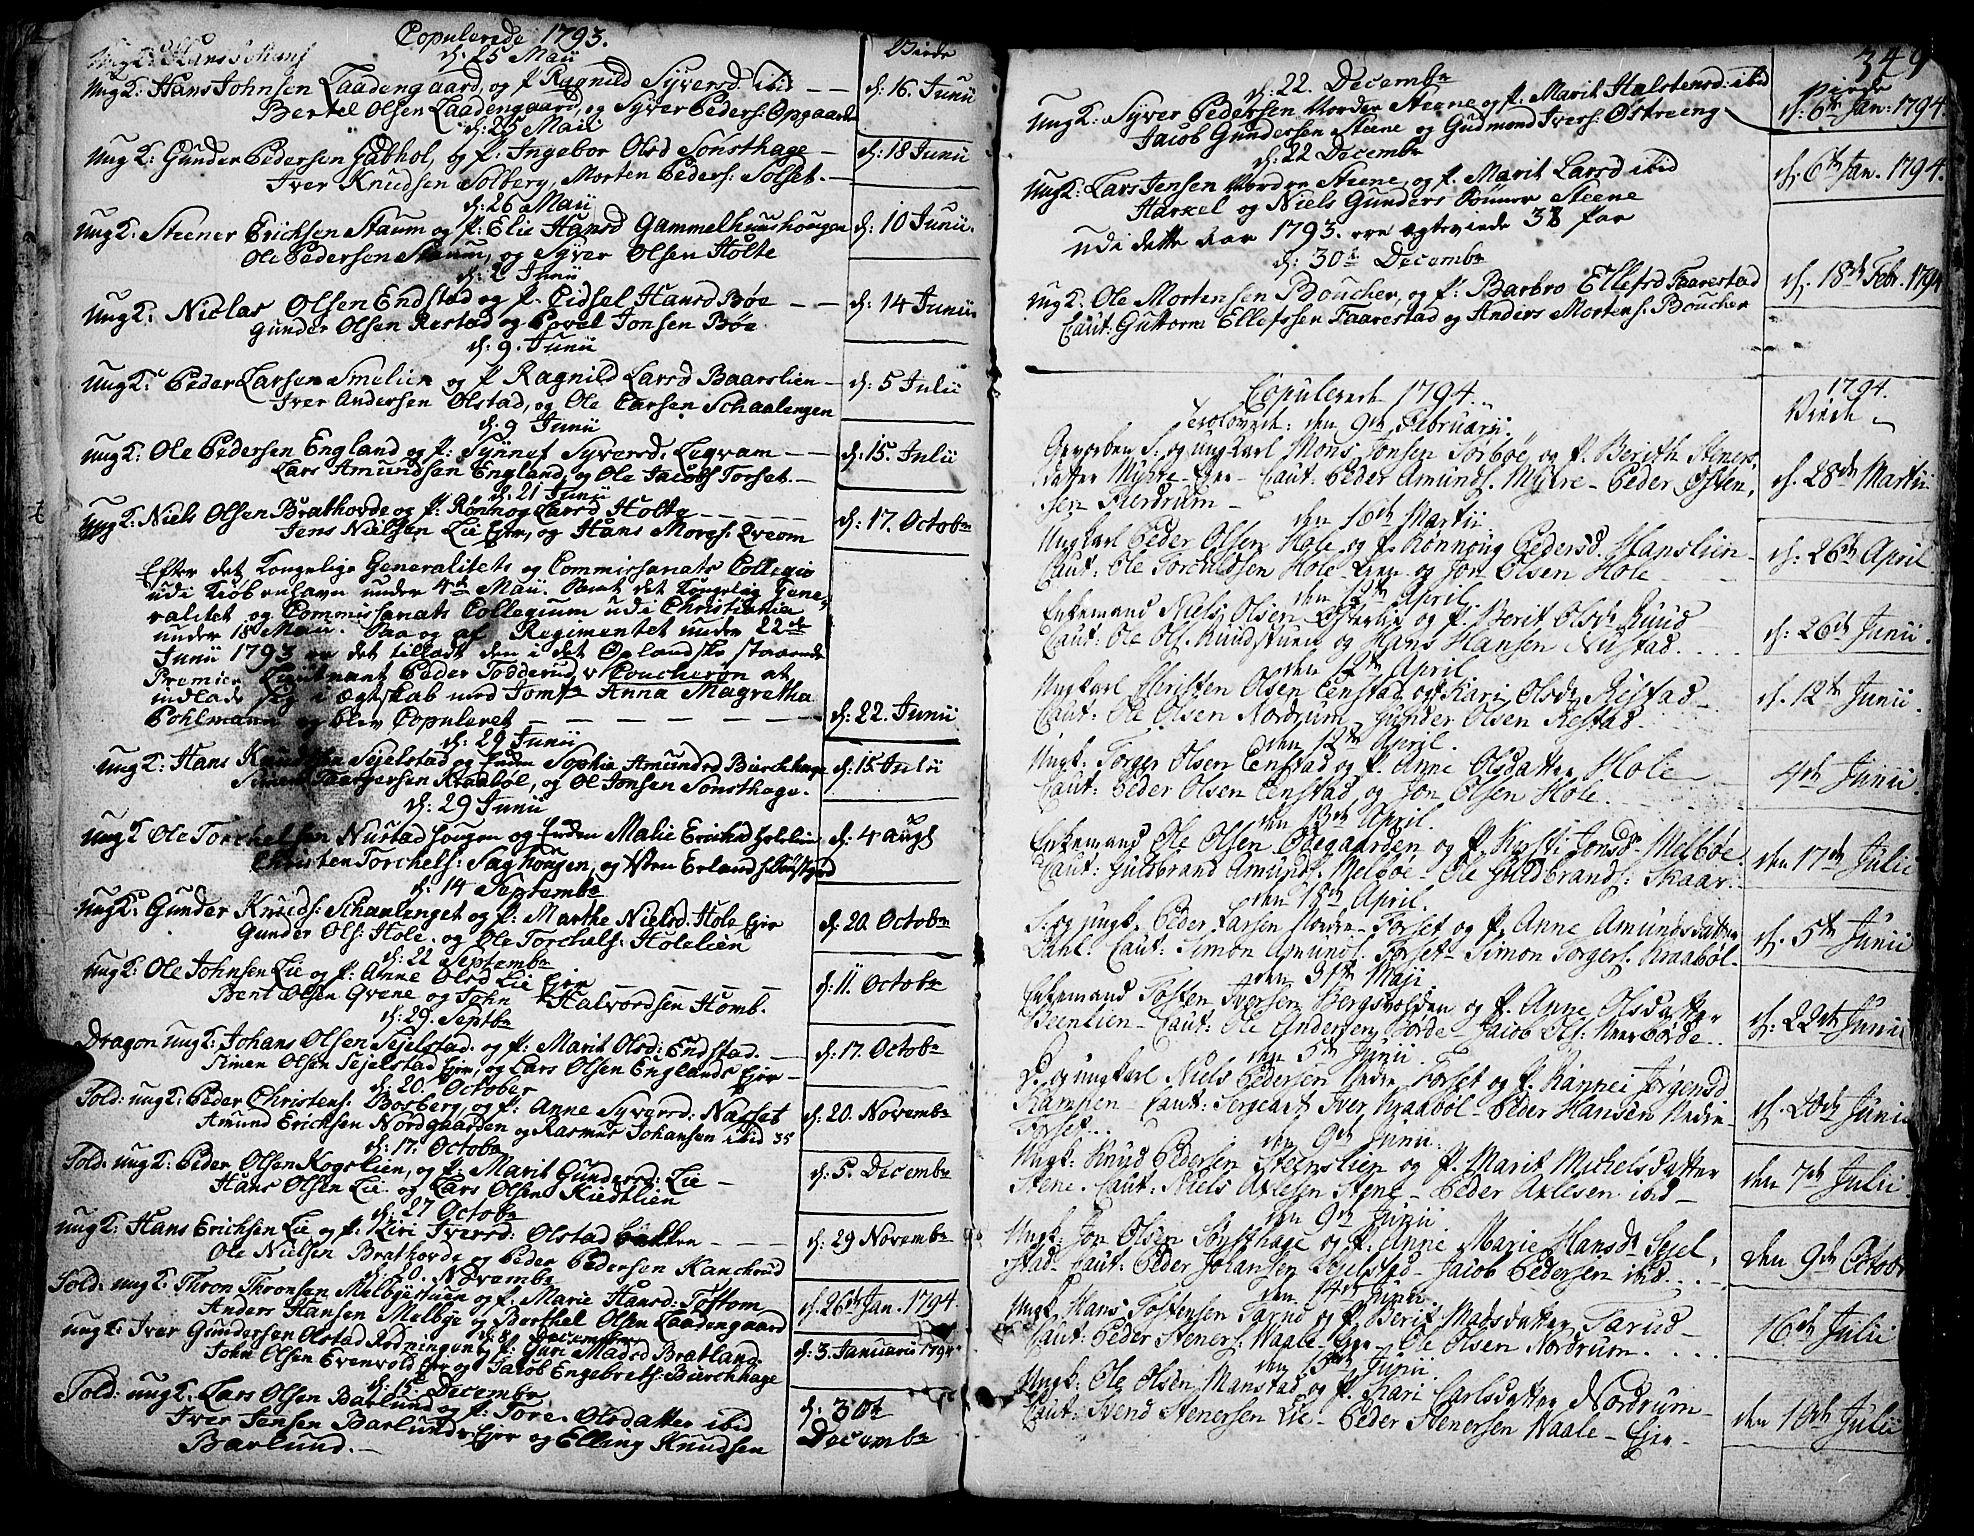 SAH, Gausdal prestekontor, Ministerialbok nr. 3, 1758-1809, s. 349